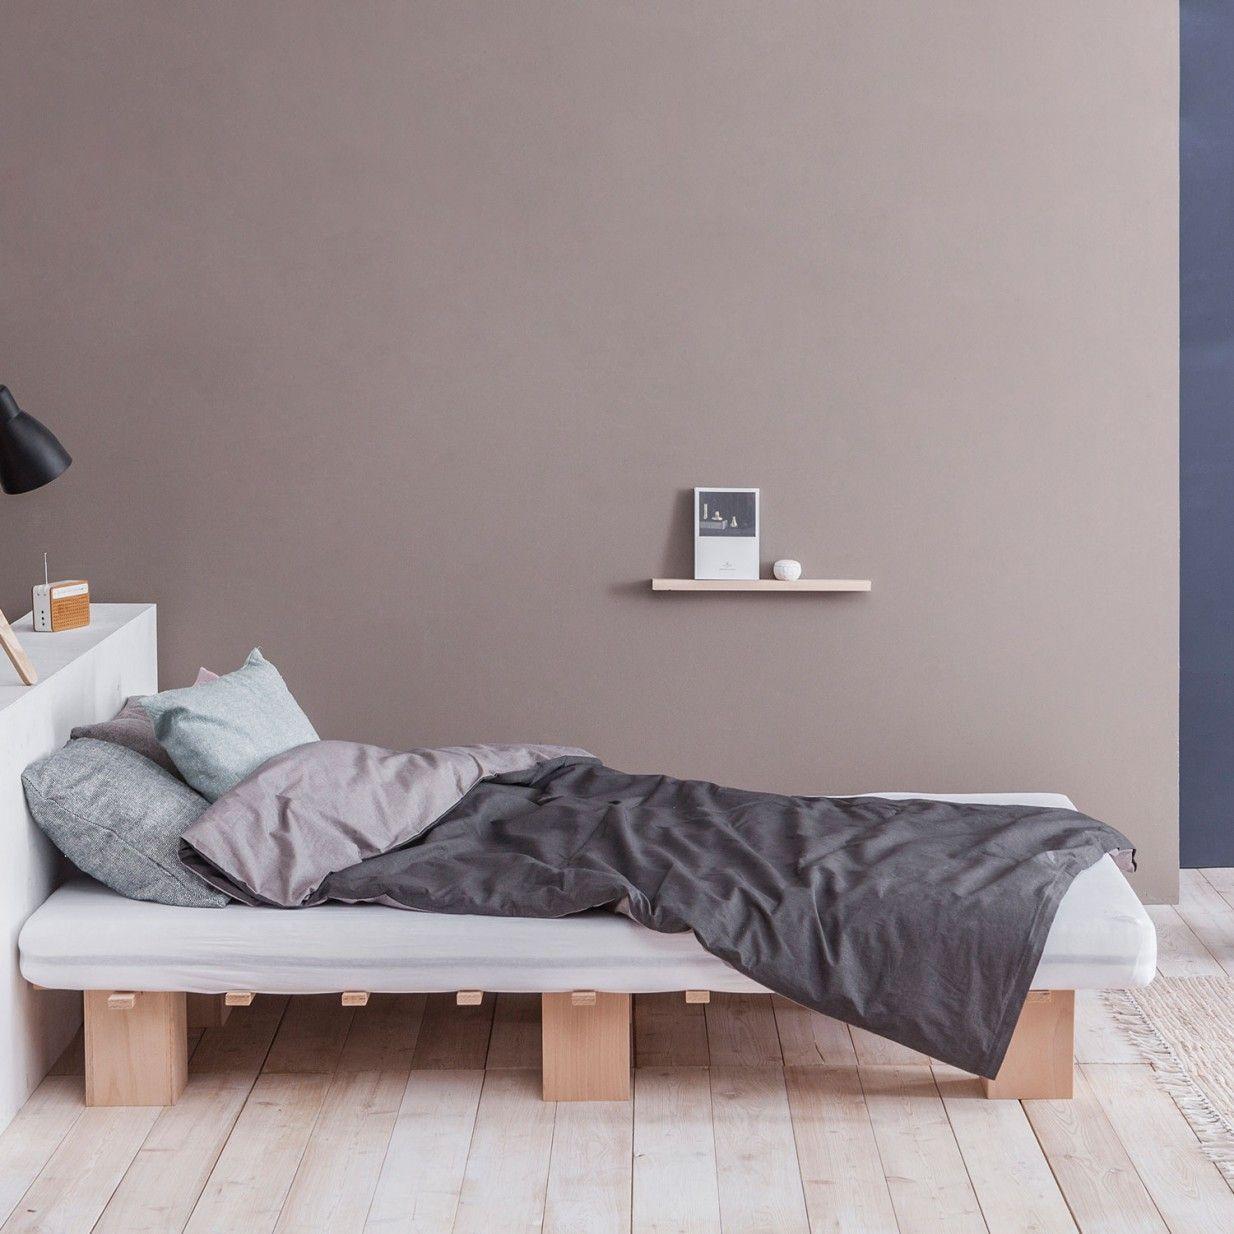 Full Size of Tojo Bett V Bewertung V Bett Bettgestell System Erfahrungsbericht Nachbau Test Gebraucht Kaufen Betten Konfigurieren Mit Beleuchtung Nussbaum 180x200 200x200 Bett Tojo Bett